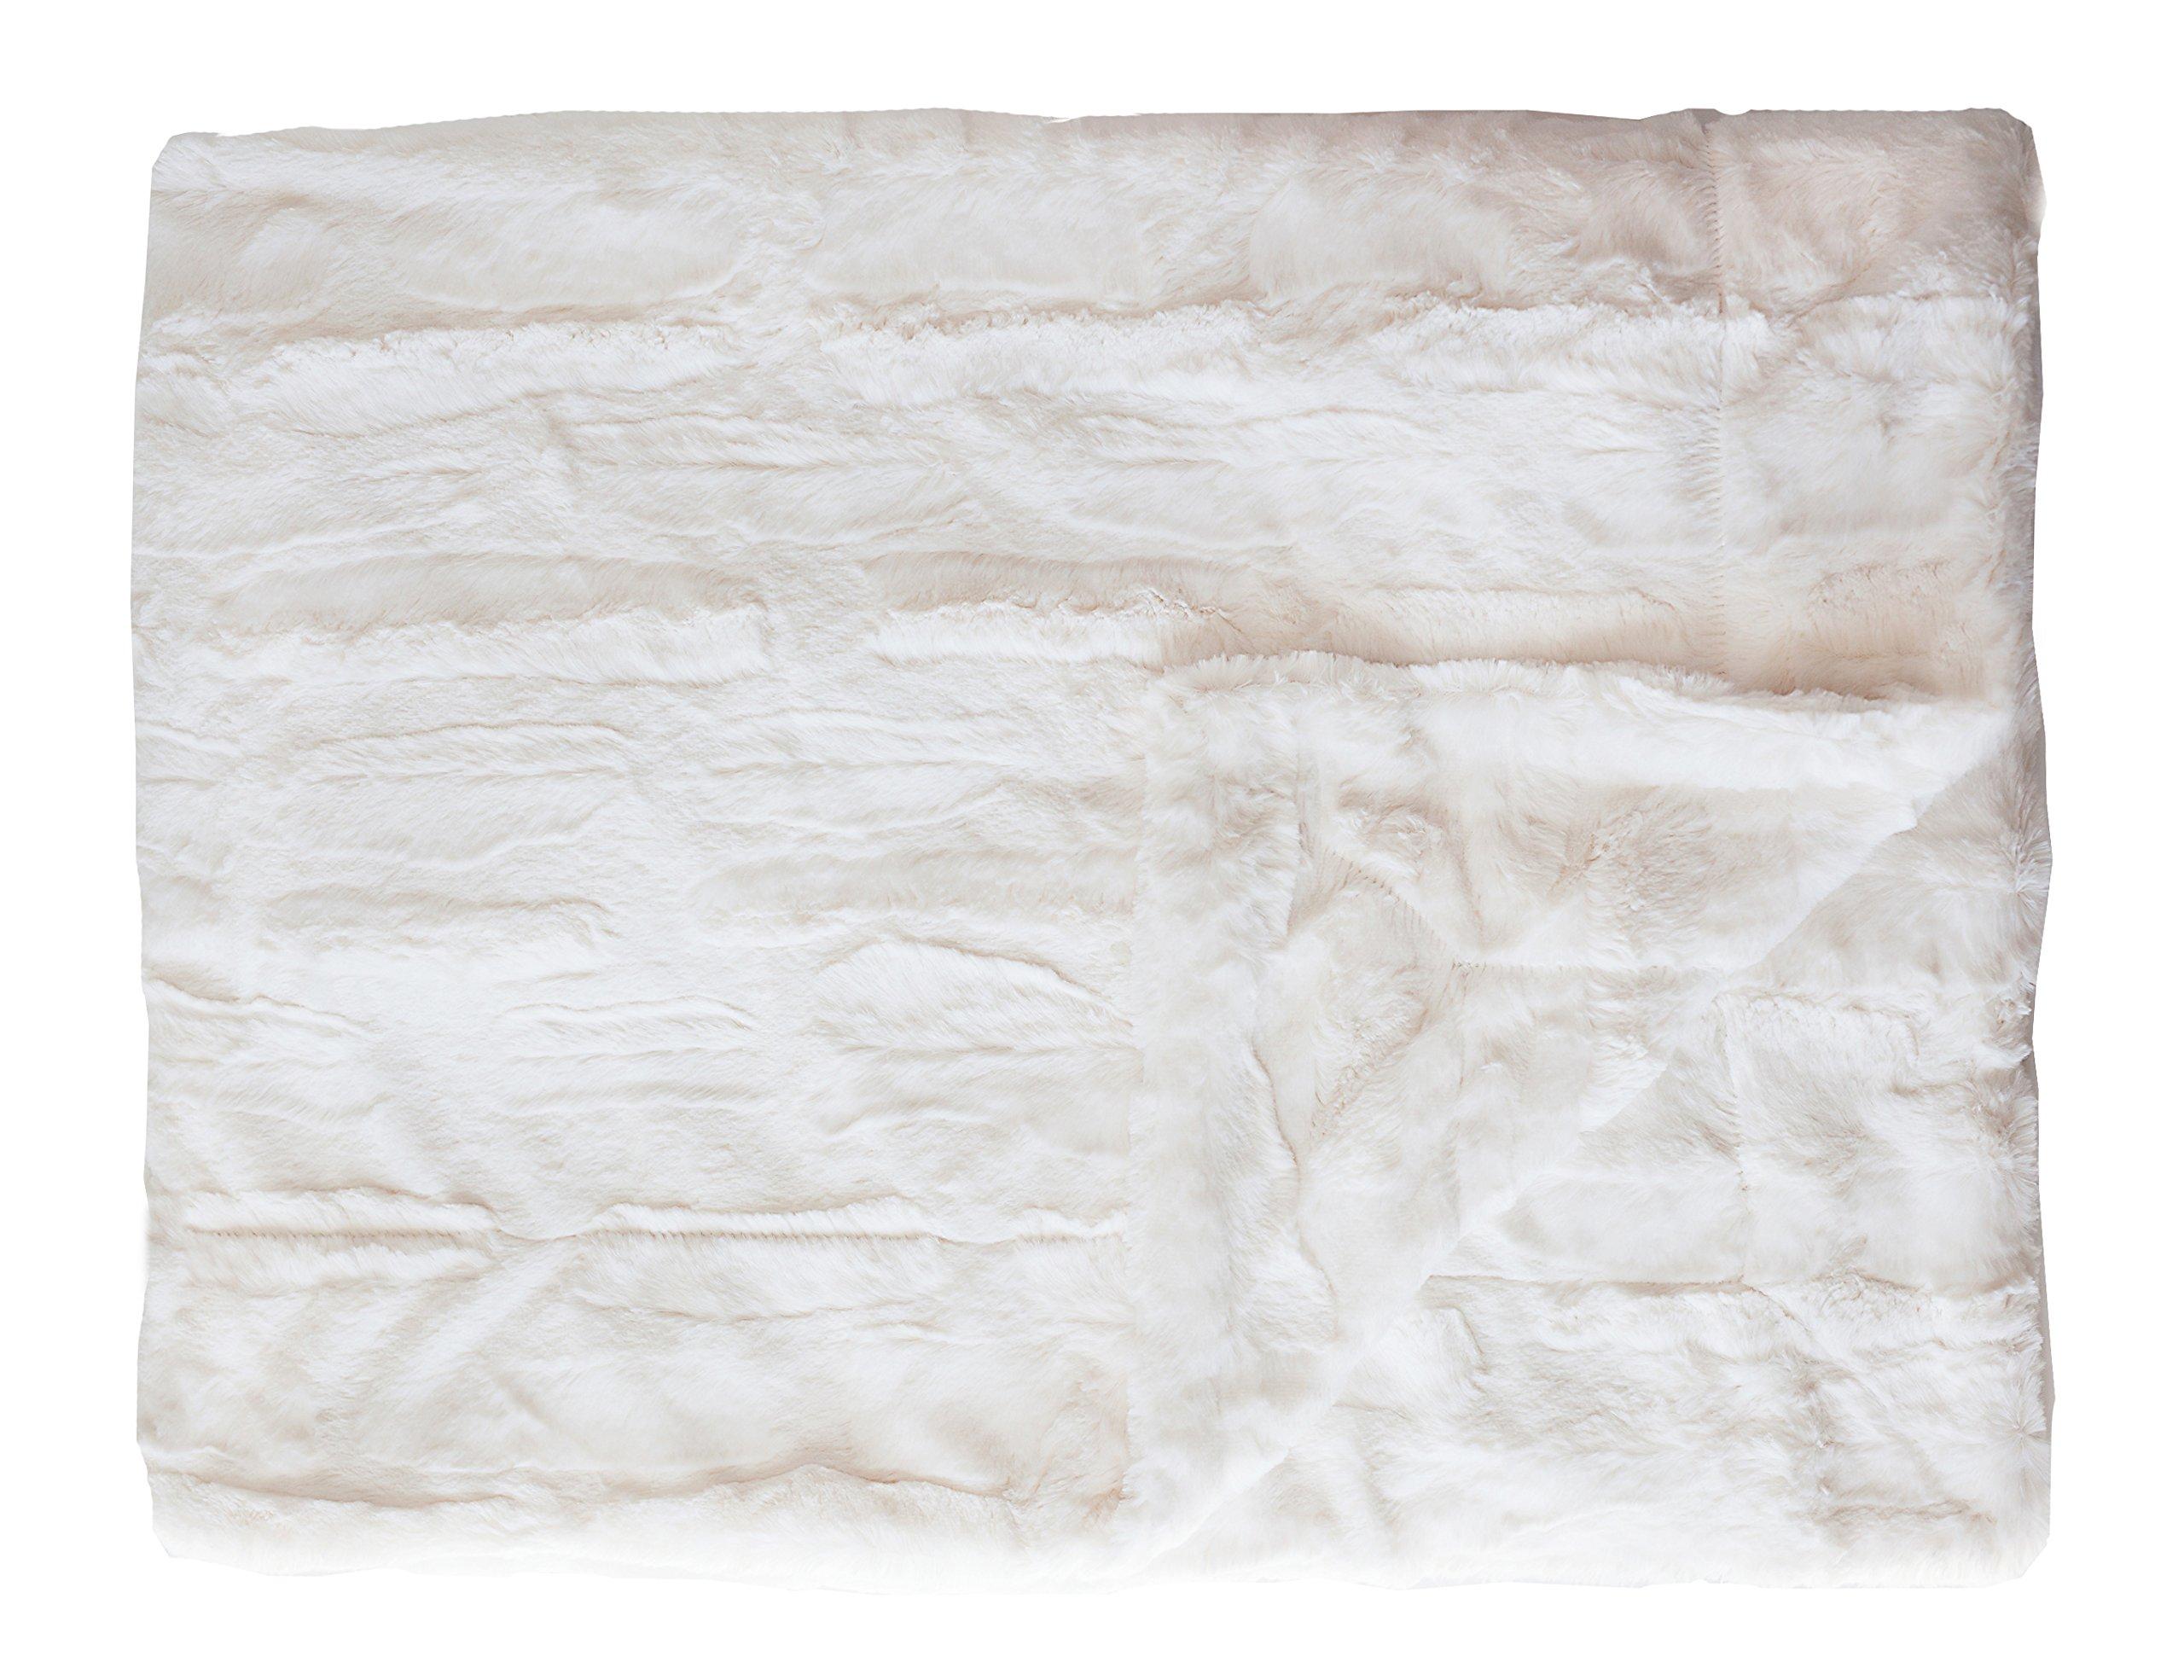 Minky Couture Premium Blanket - Soft, Warm, Cozy, Comfortable, Perfect Gift! (Grande, Sorbet Vanilla)